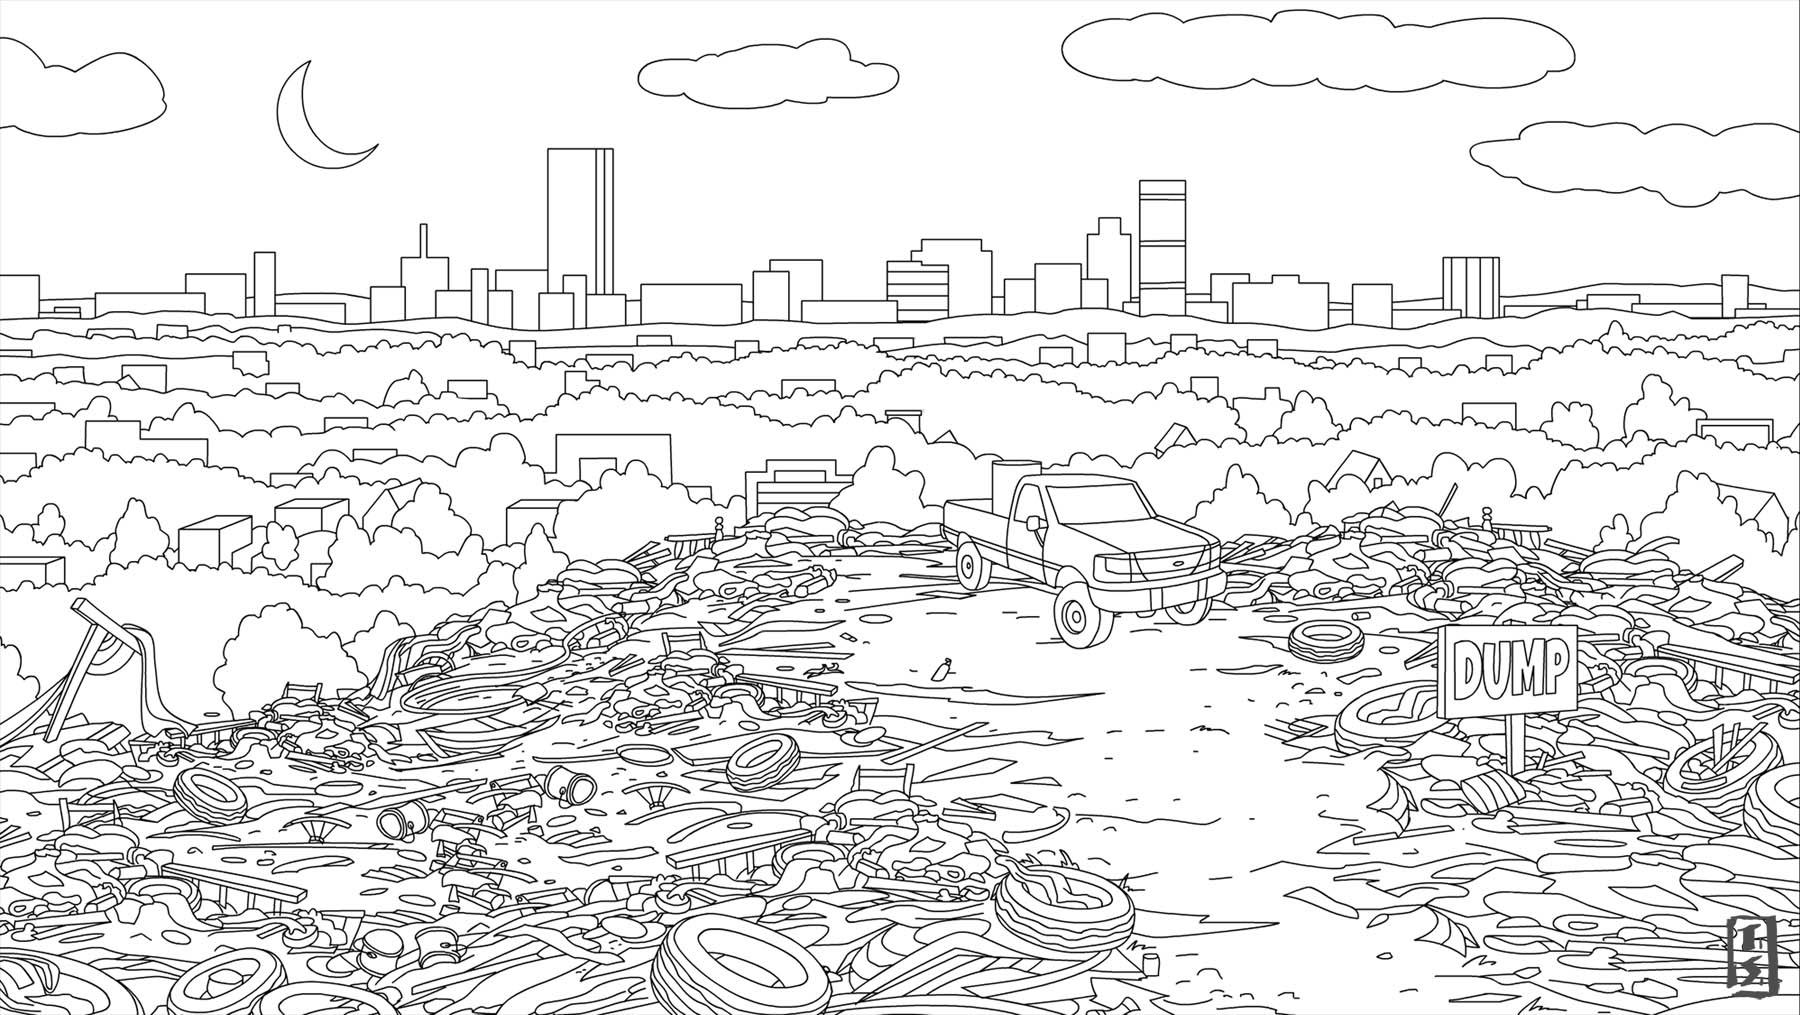 Bojack Horseman city dump